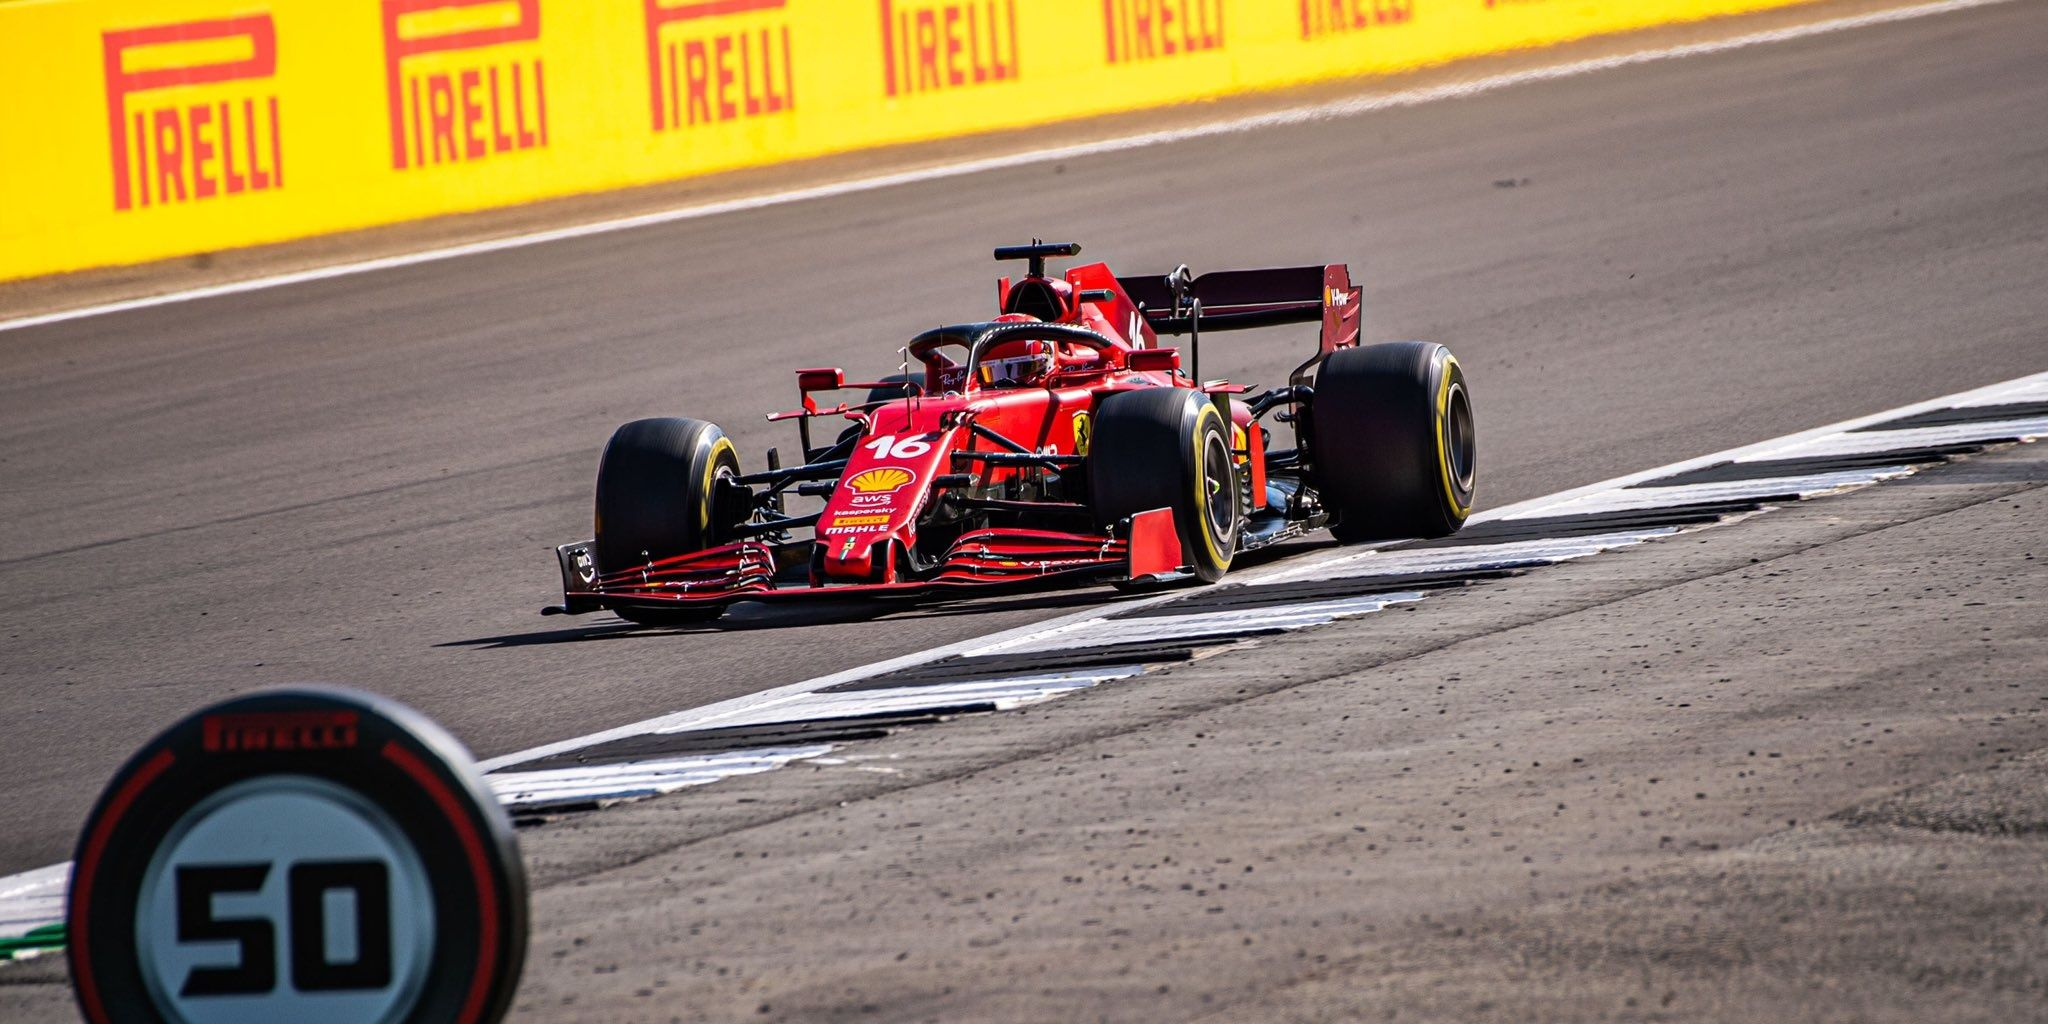 Lewis Hamilton Takes His Eighth British Grand Prix Victory